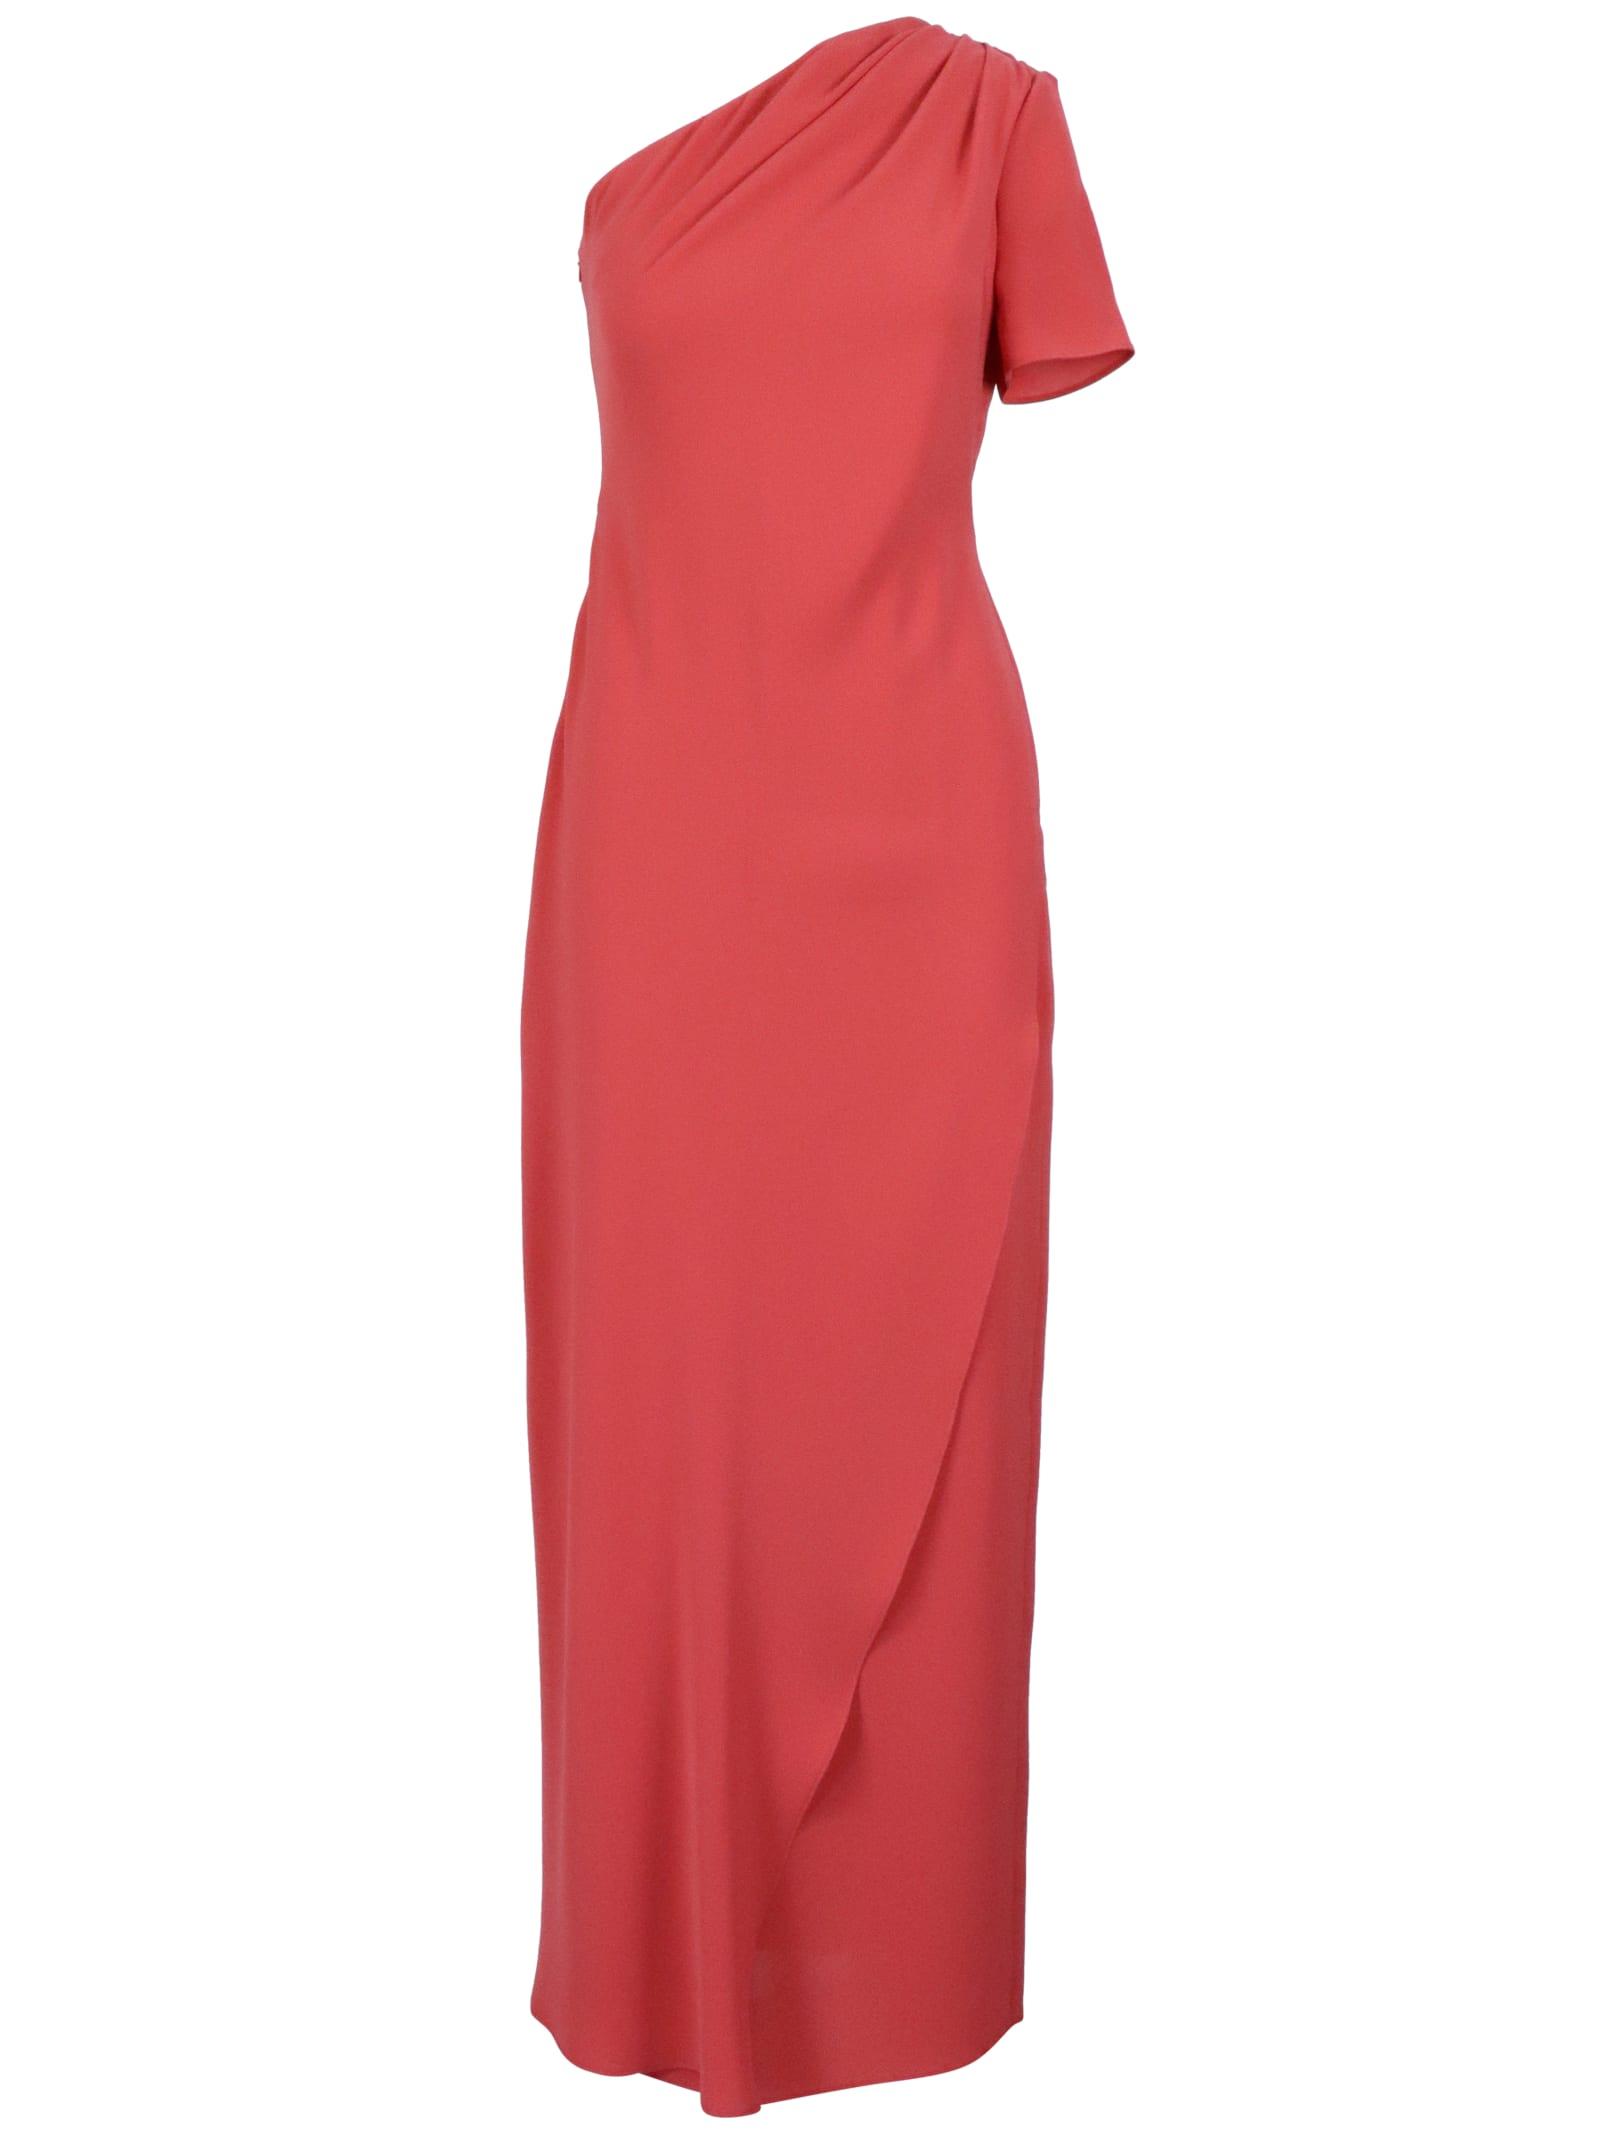 Max Mara Studio Long Dress Dress